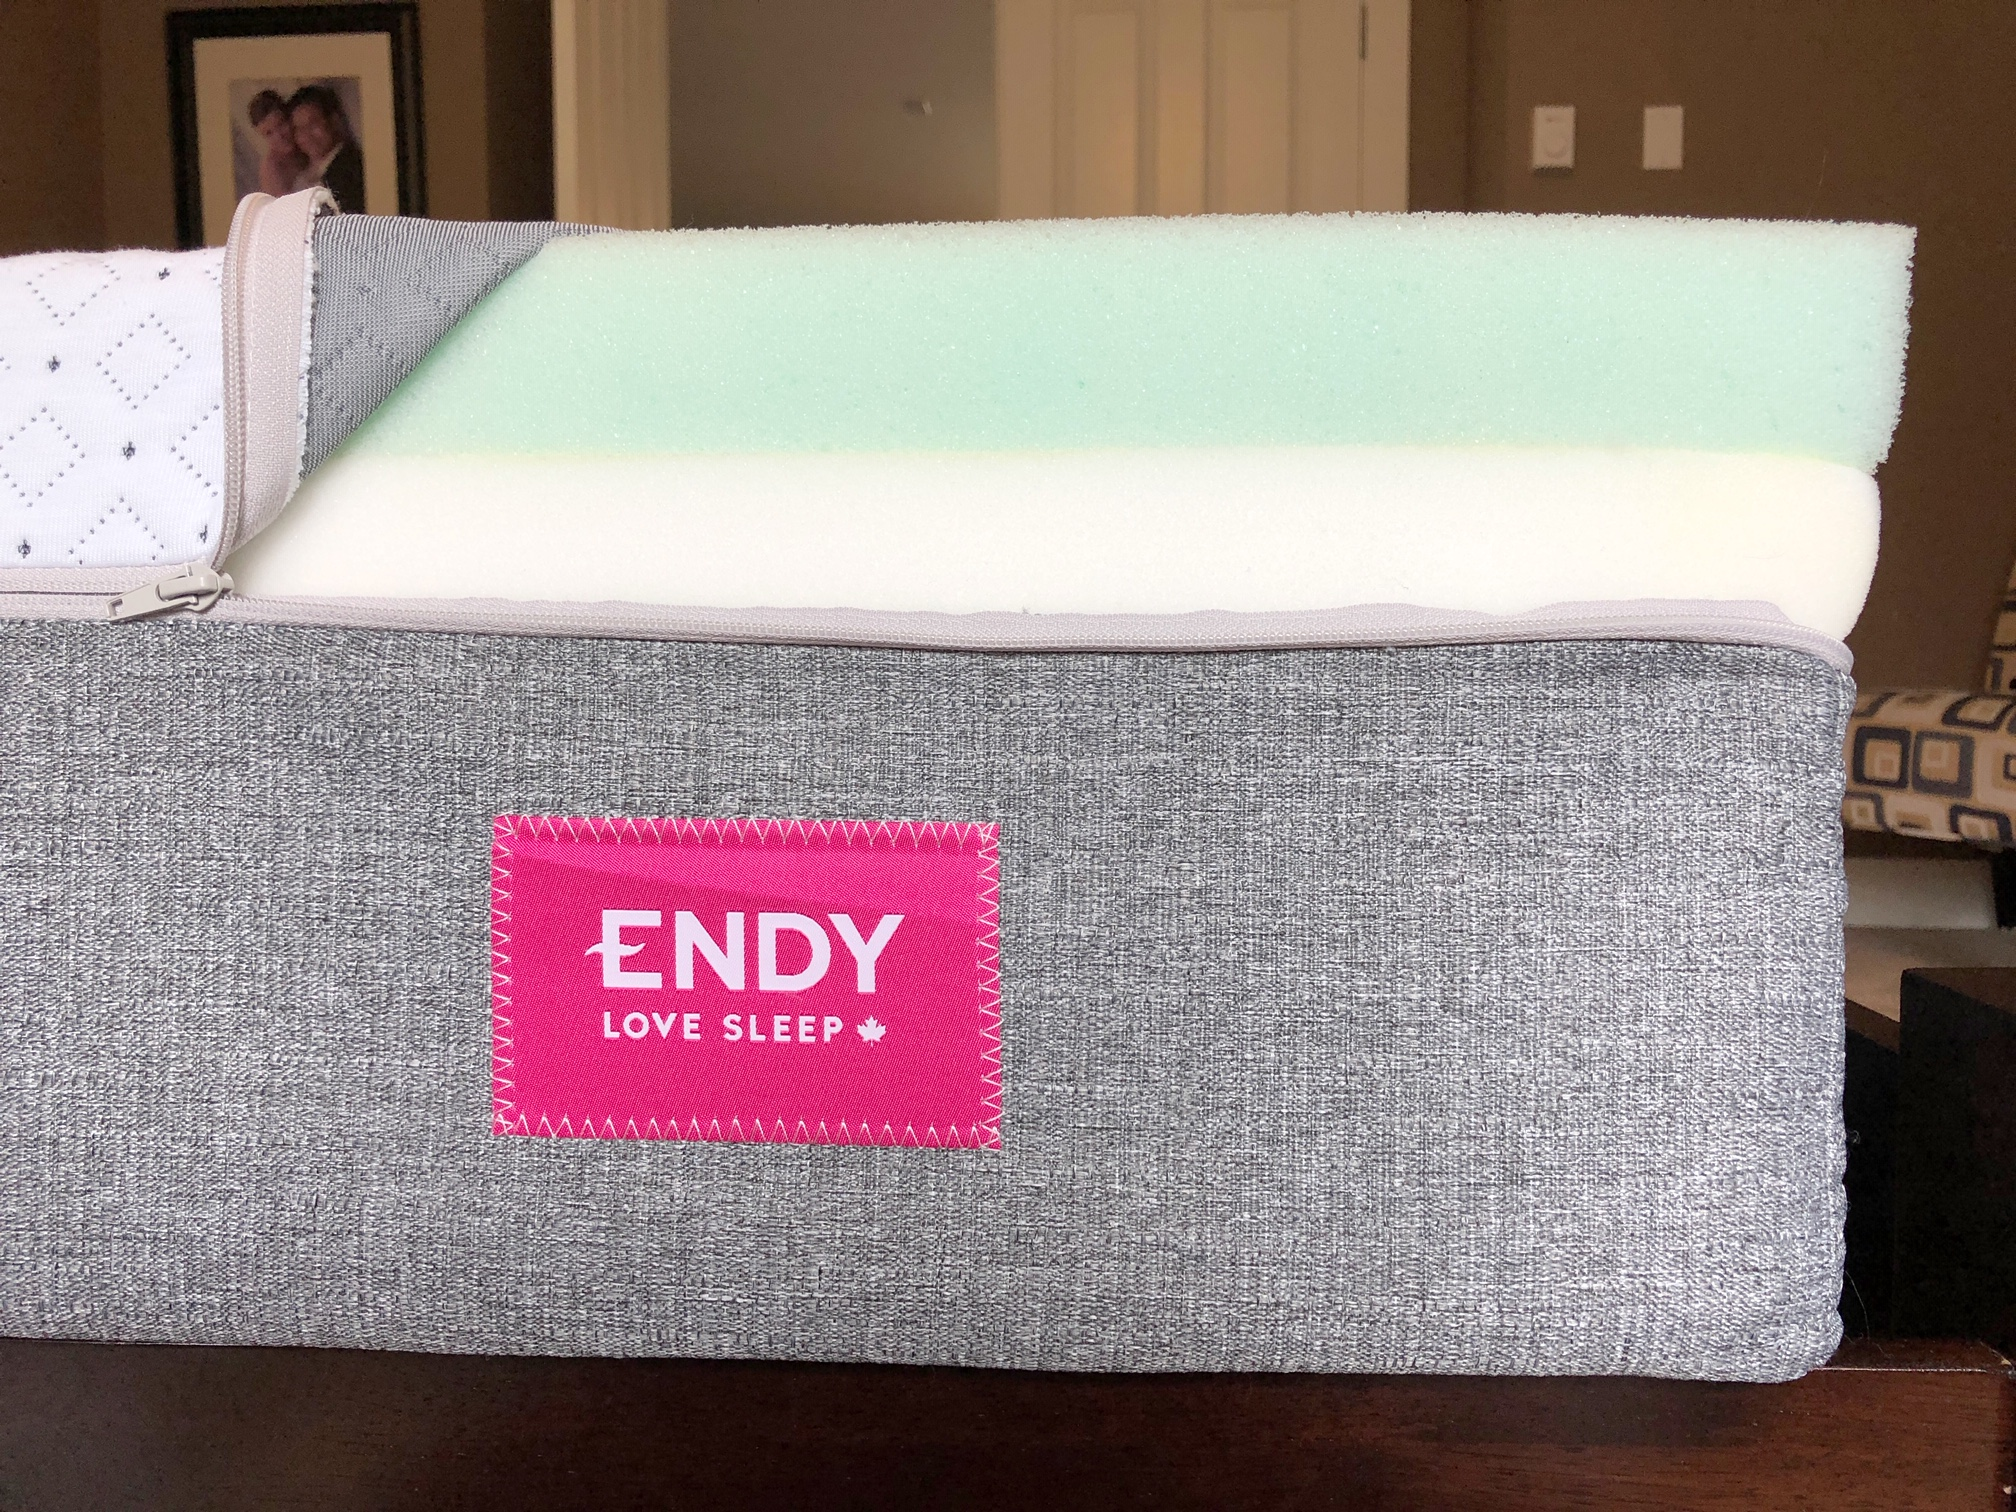 Endy Mattress foam